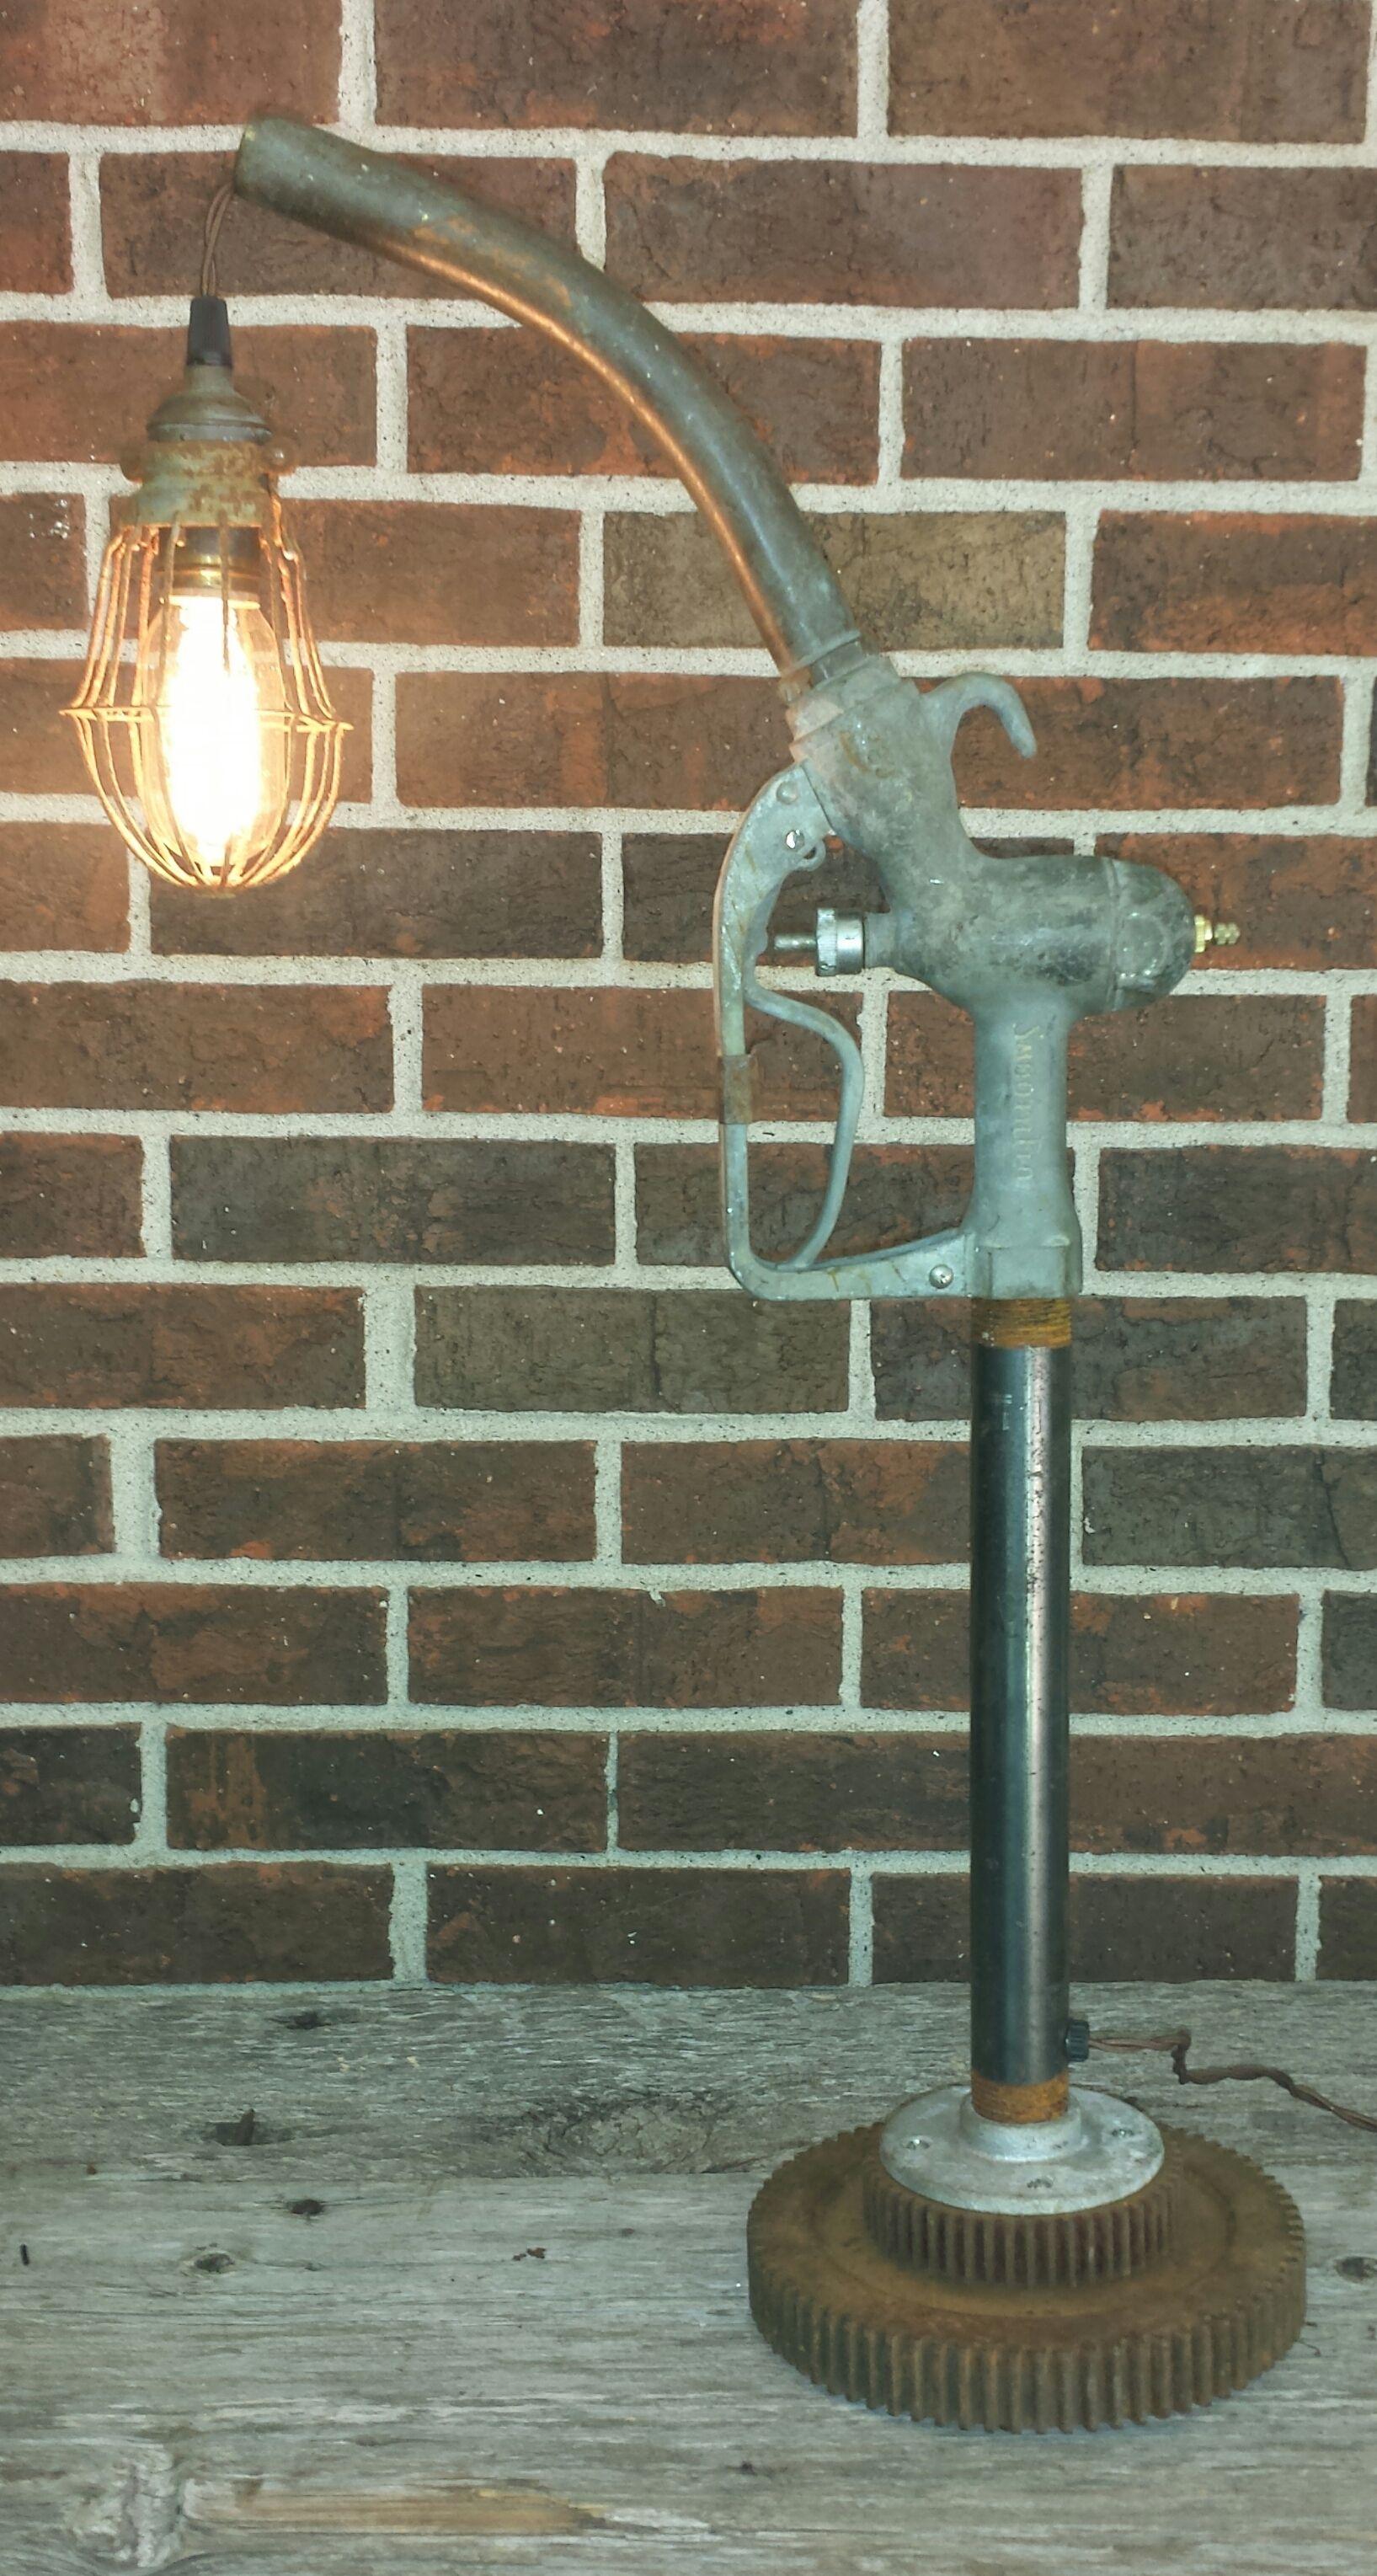 Custom table lamp using repurposed vintage trouble light gas pump custom table lamp using repurposed vintage trouble light gas pump nozzle and cast iron base geotapseo Gallery